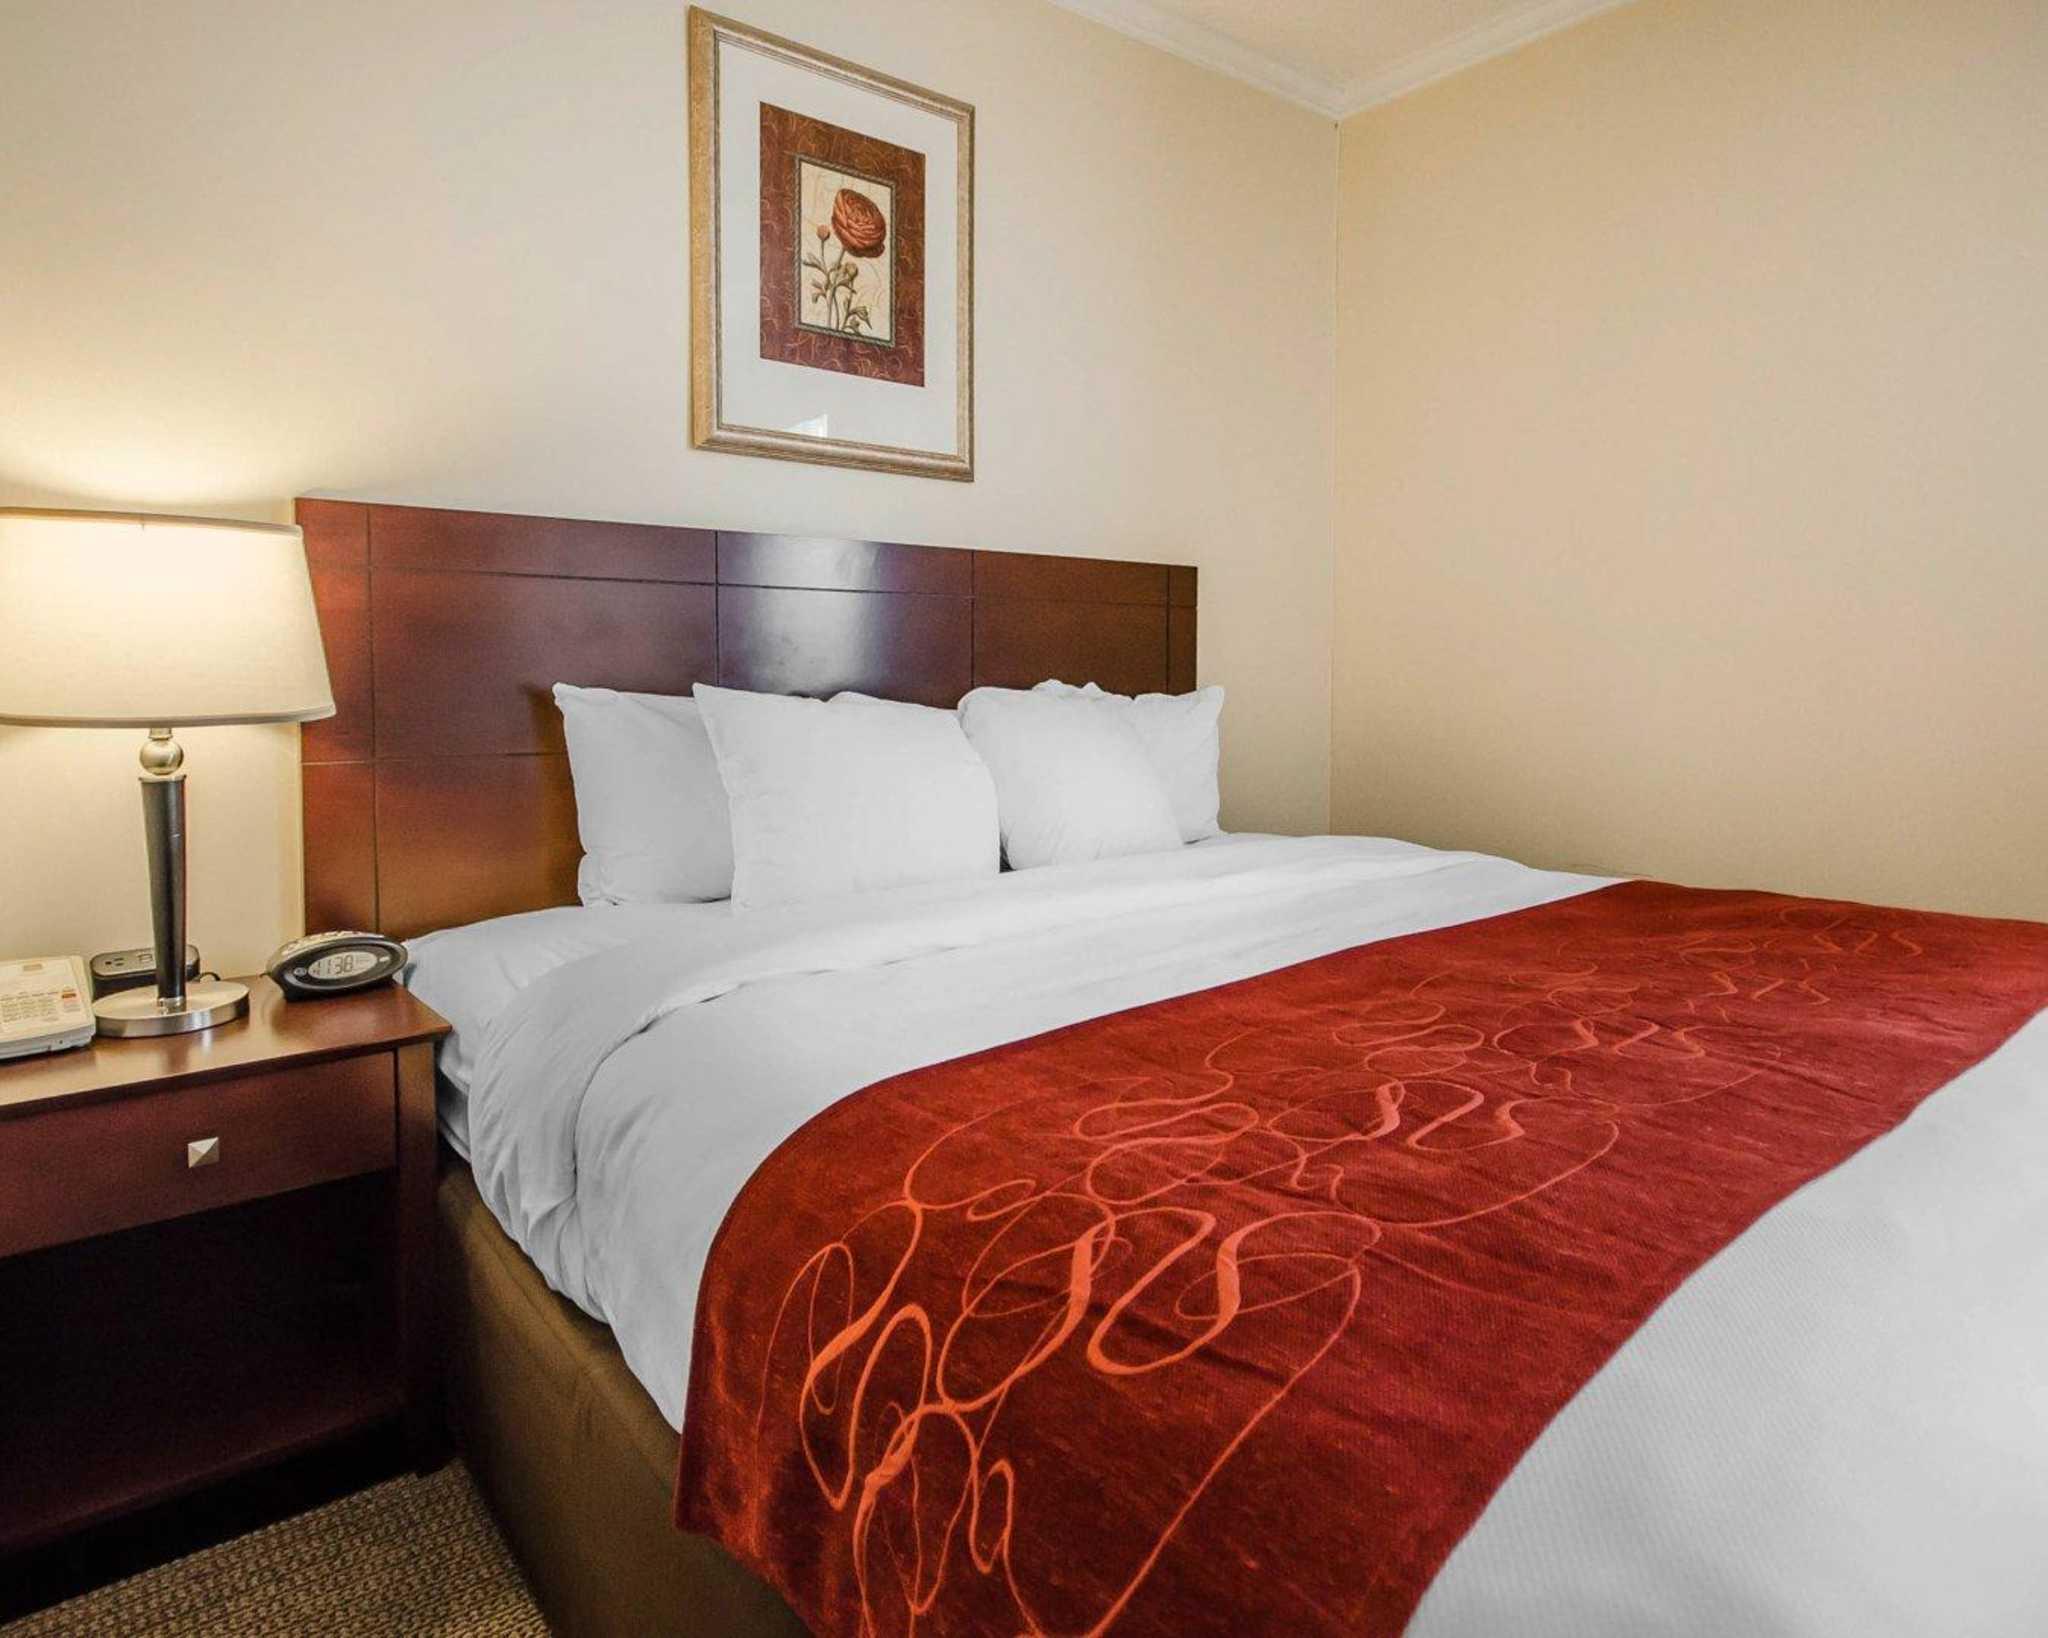 Quality Suites image 2